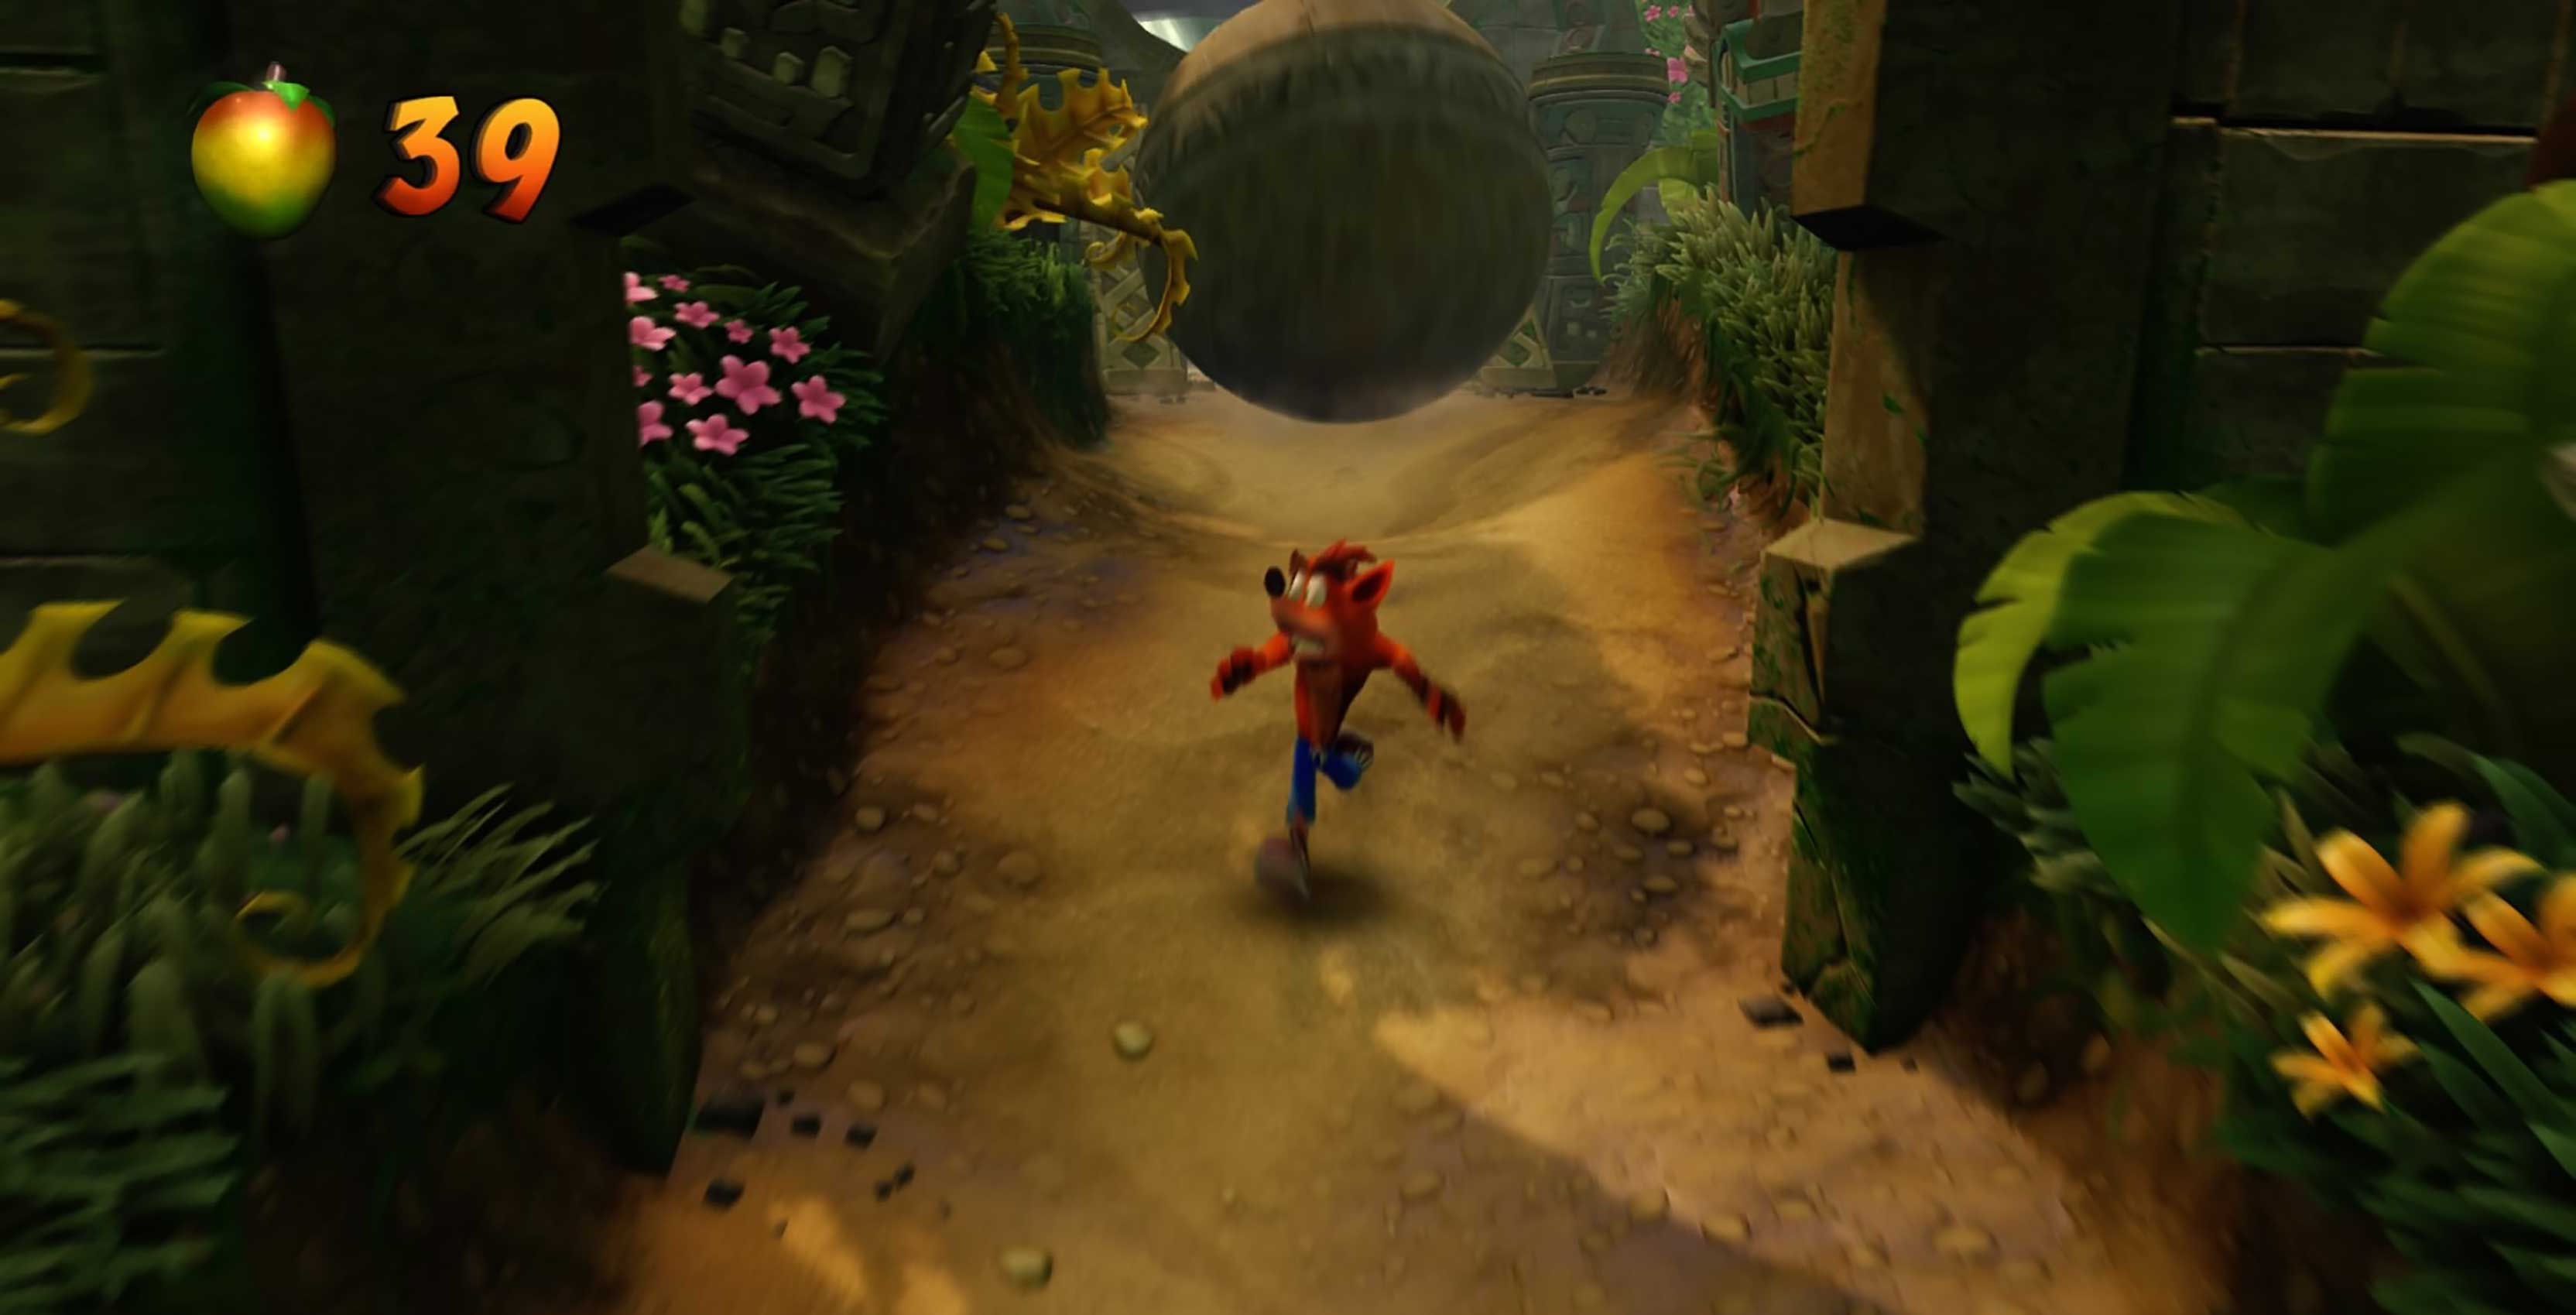 Crash Bandicoot running from boulder